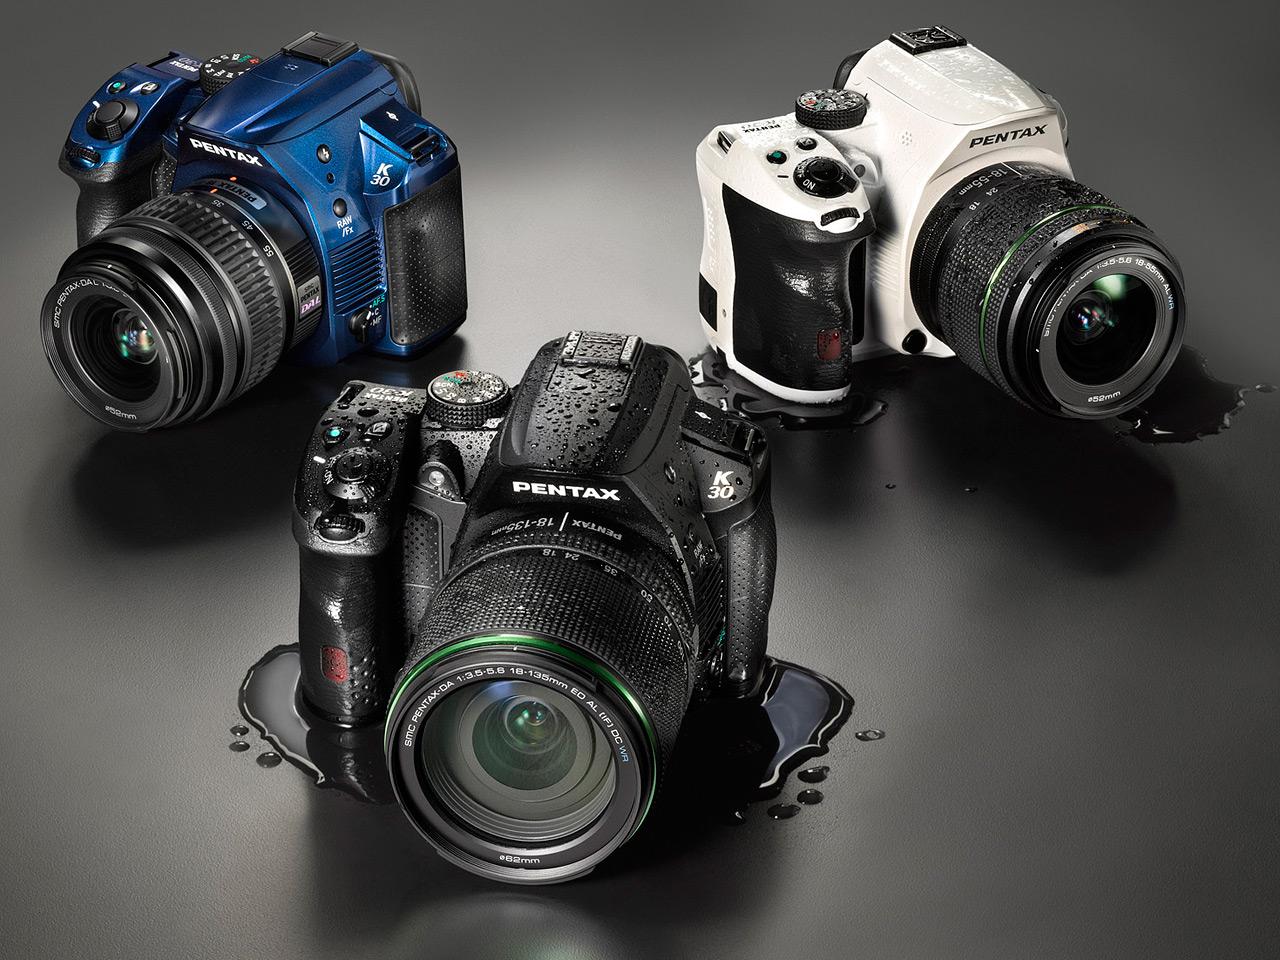 Camera Latest Pentax Dslr Camera pentax k 30 16mp weather sealed mid level dslr previewed digital introduces new slr camera